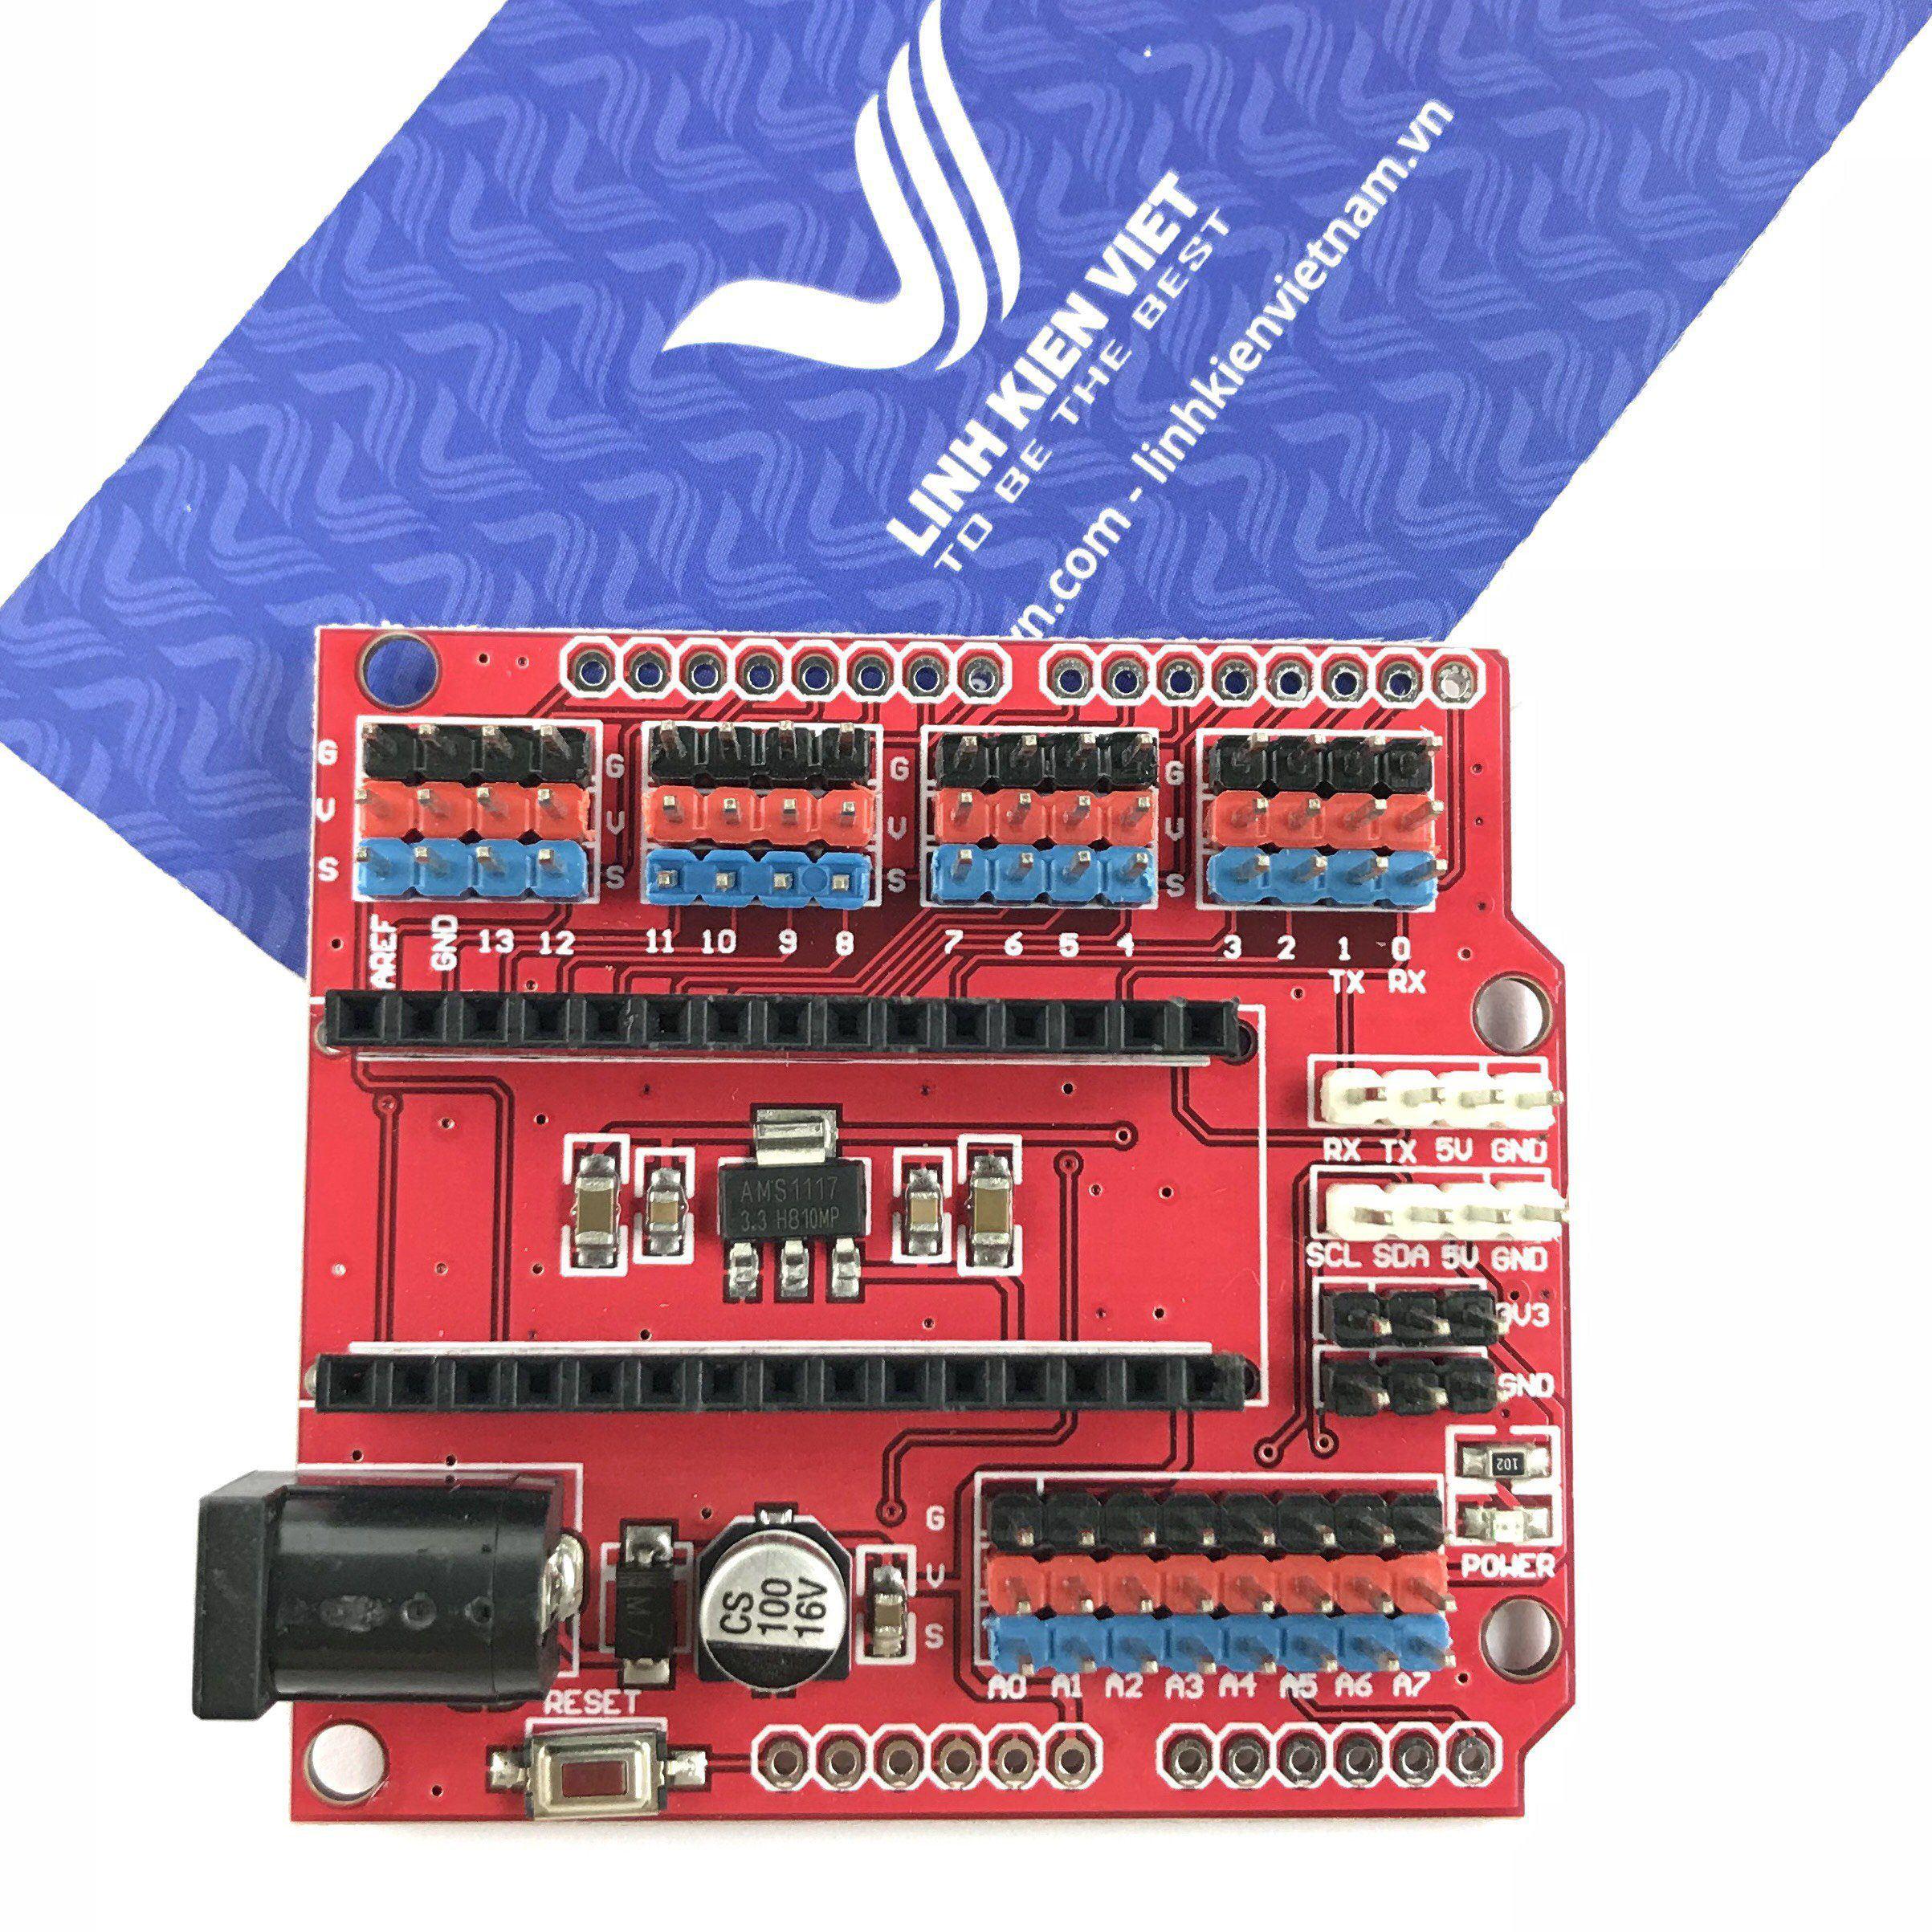 Board Mở Rộng Arduino Nano Sang UNO - X2H5